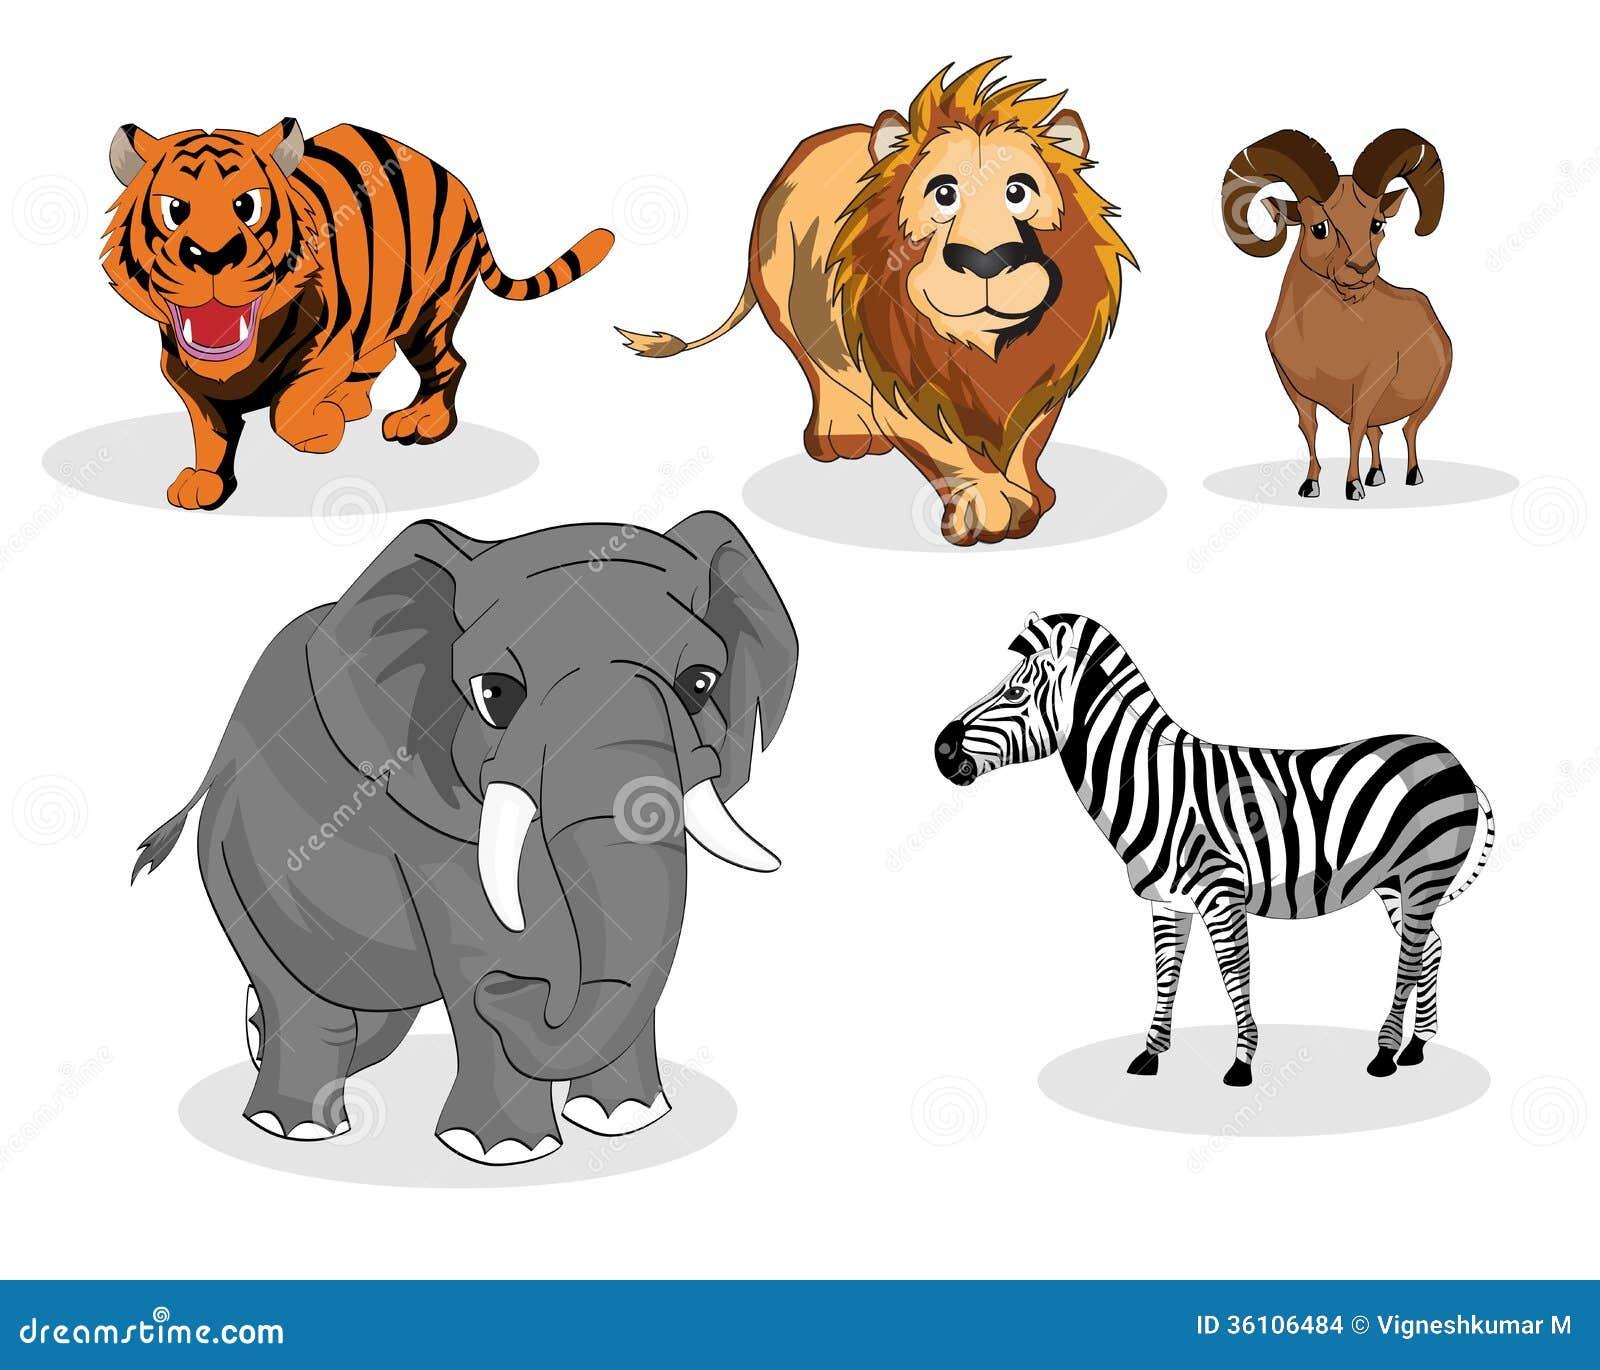 Herbivore animals clipart - photo#14